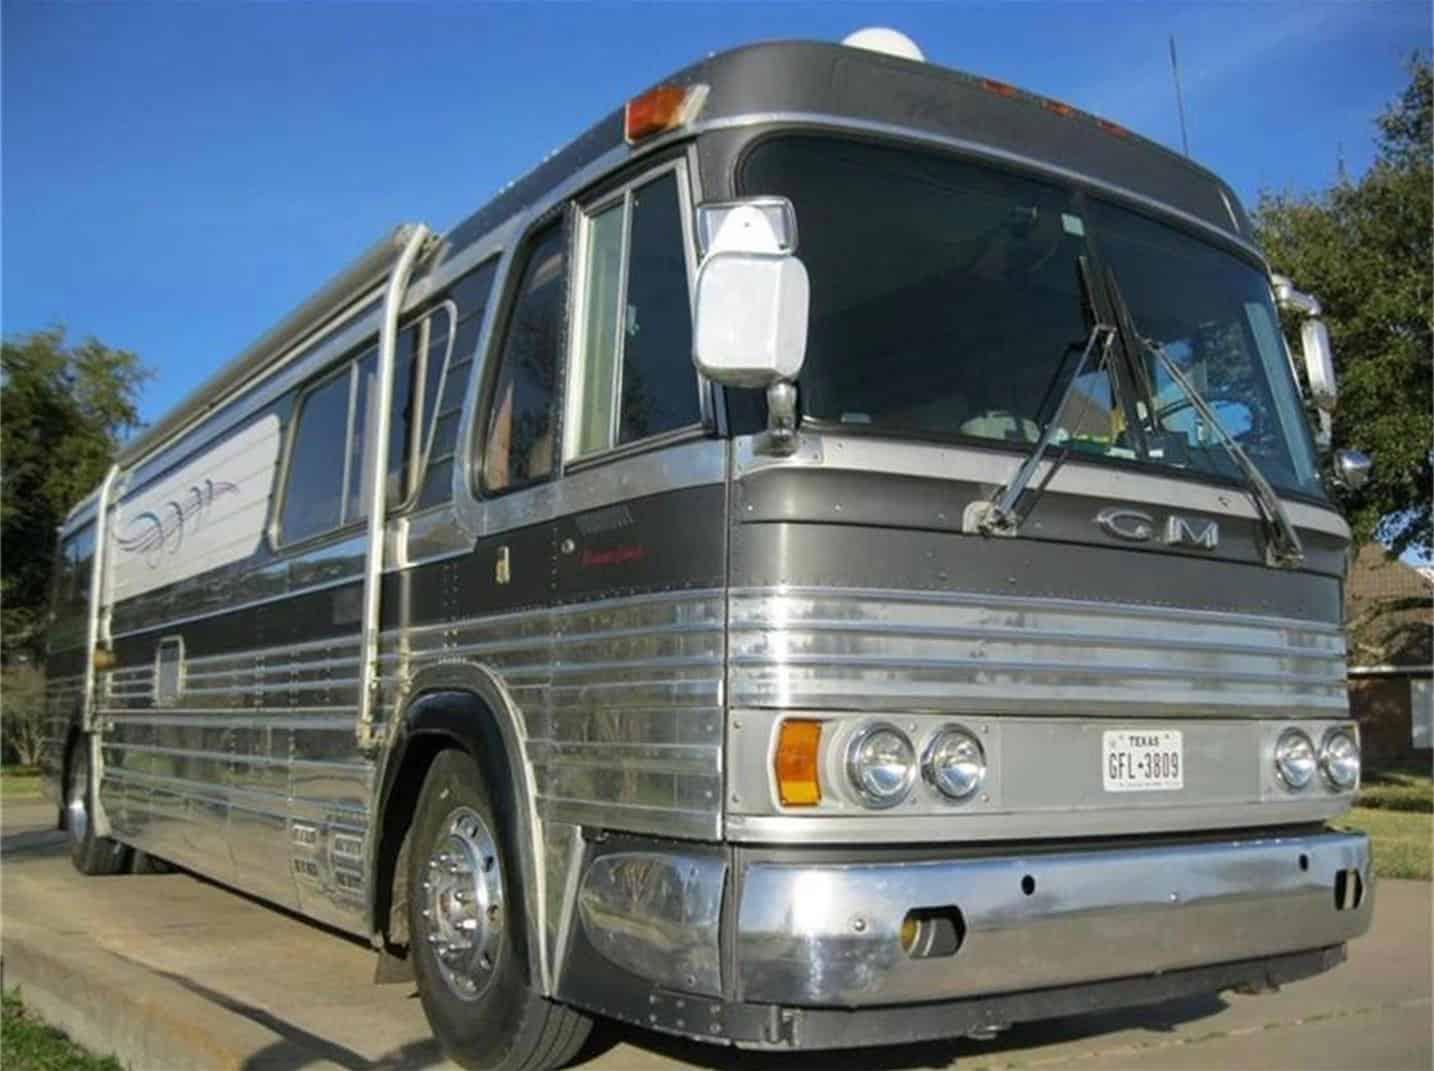 GM motorcoach